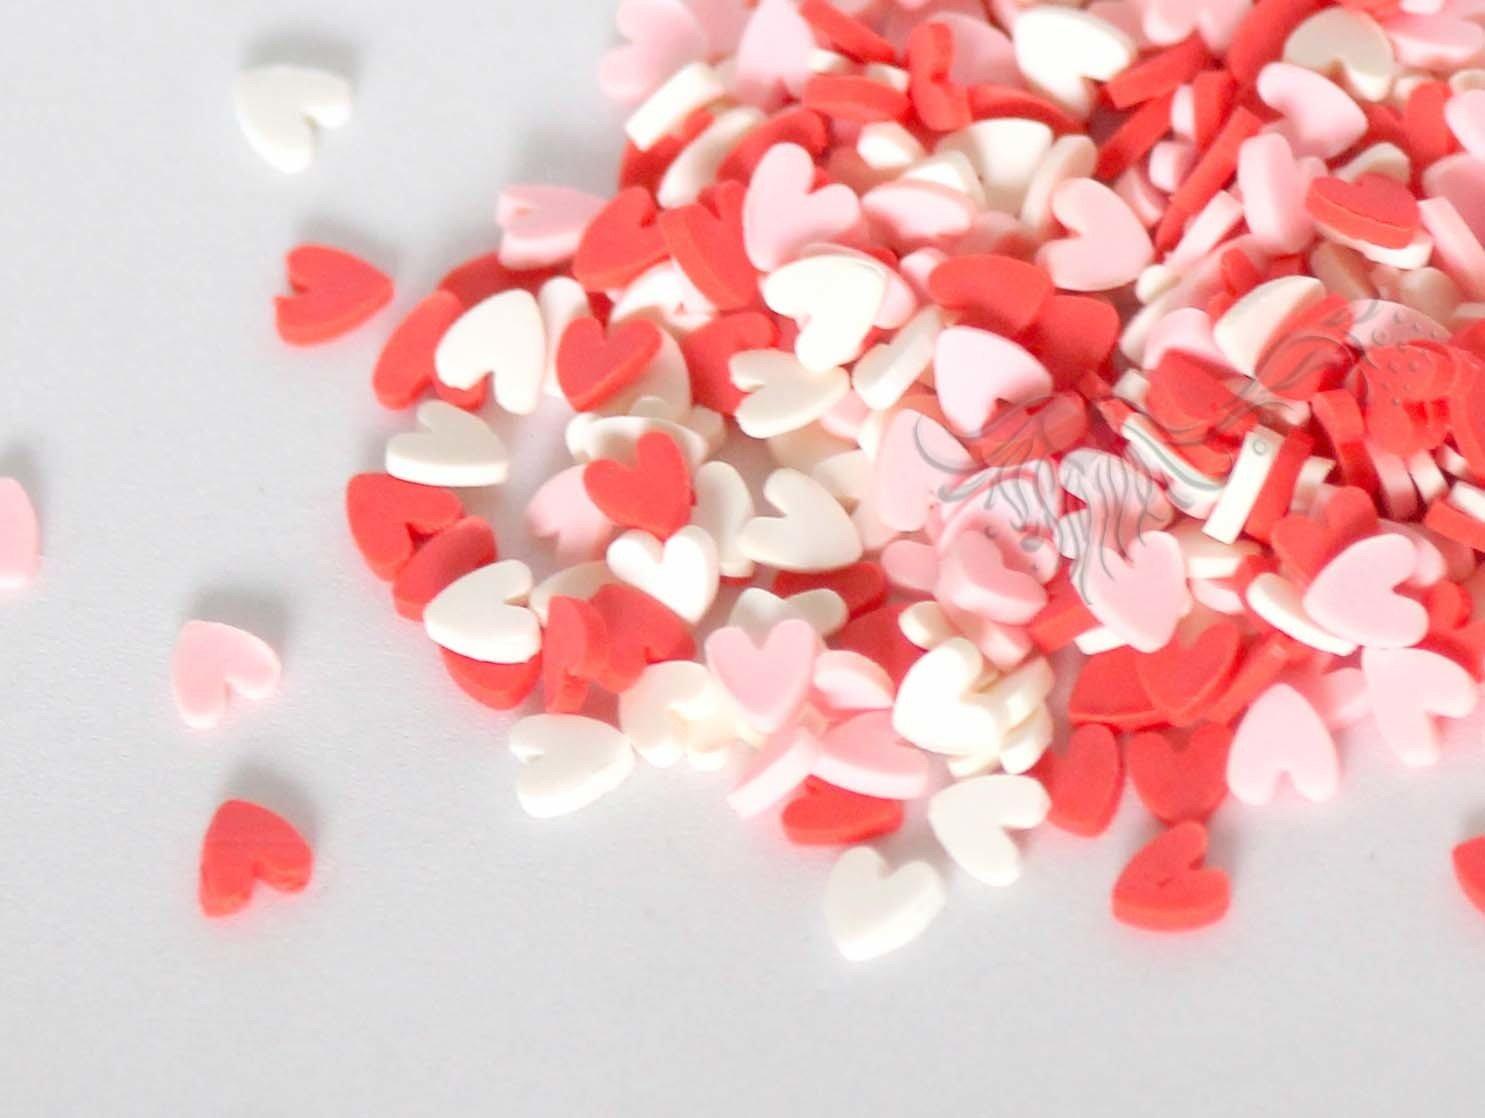 Stardust PINK HEARTS Shaker Bits